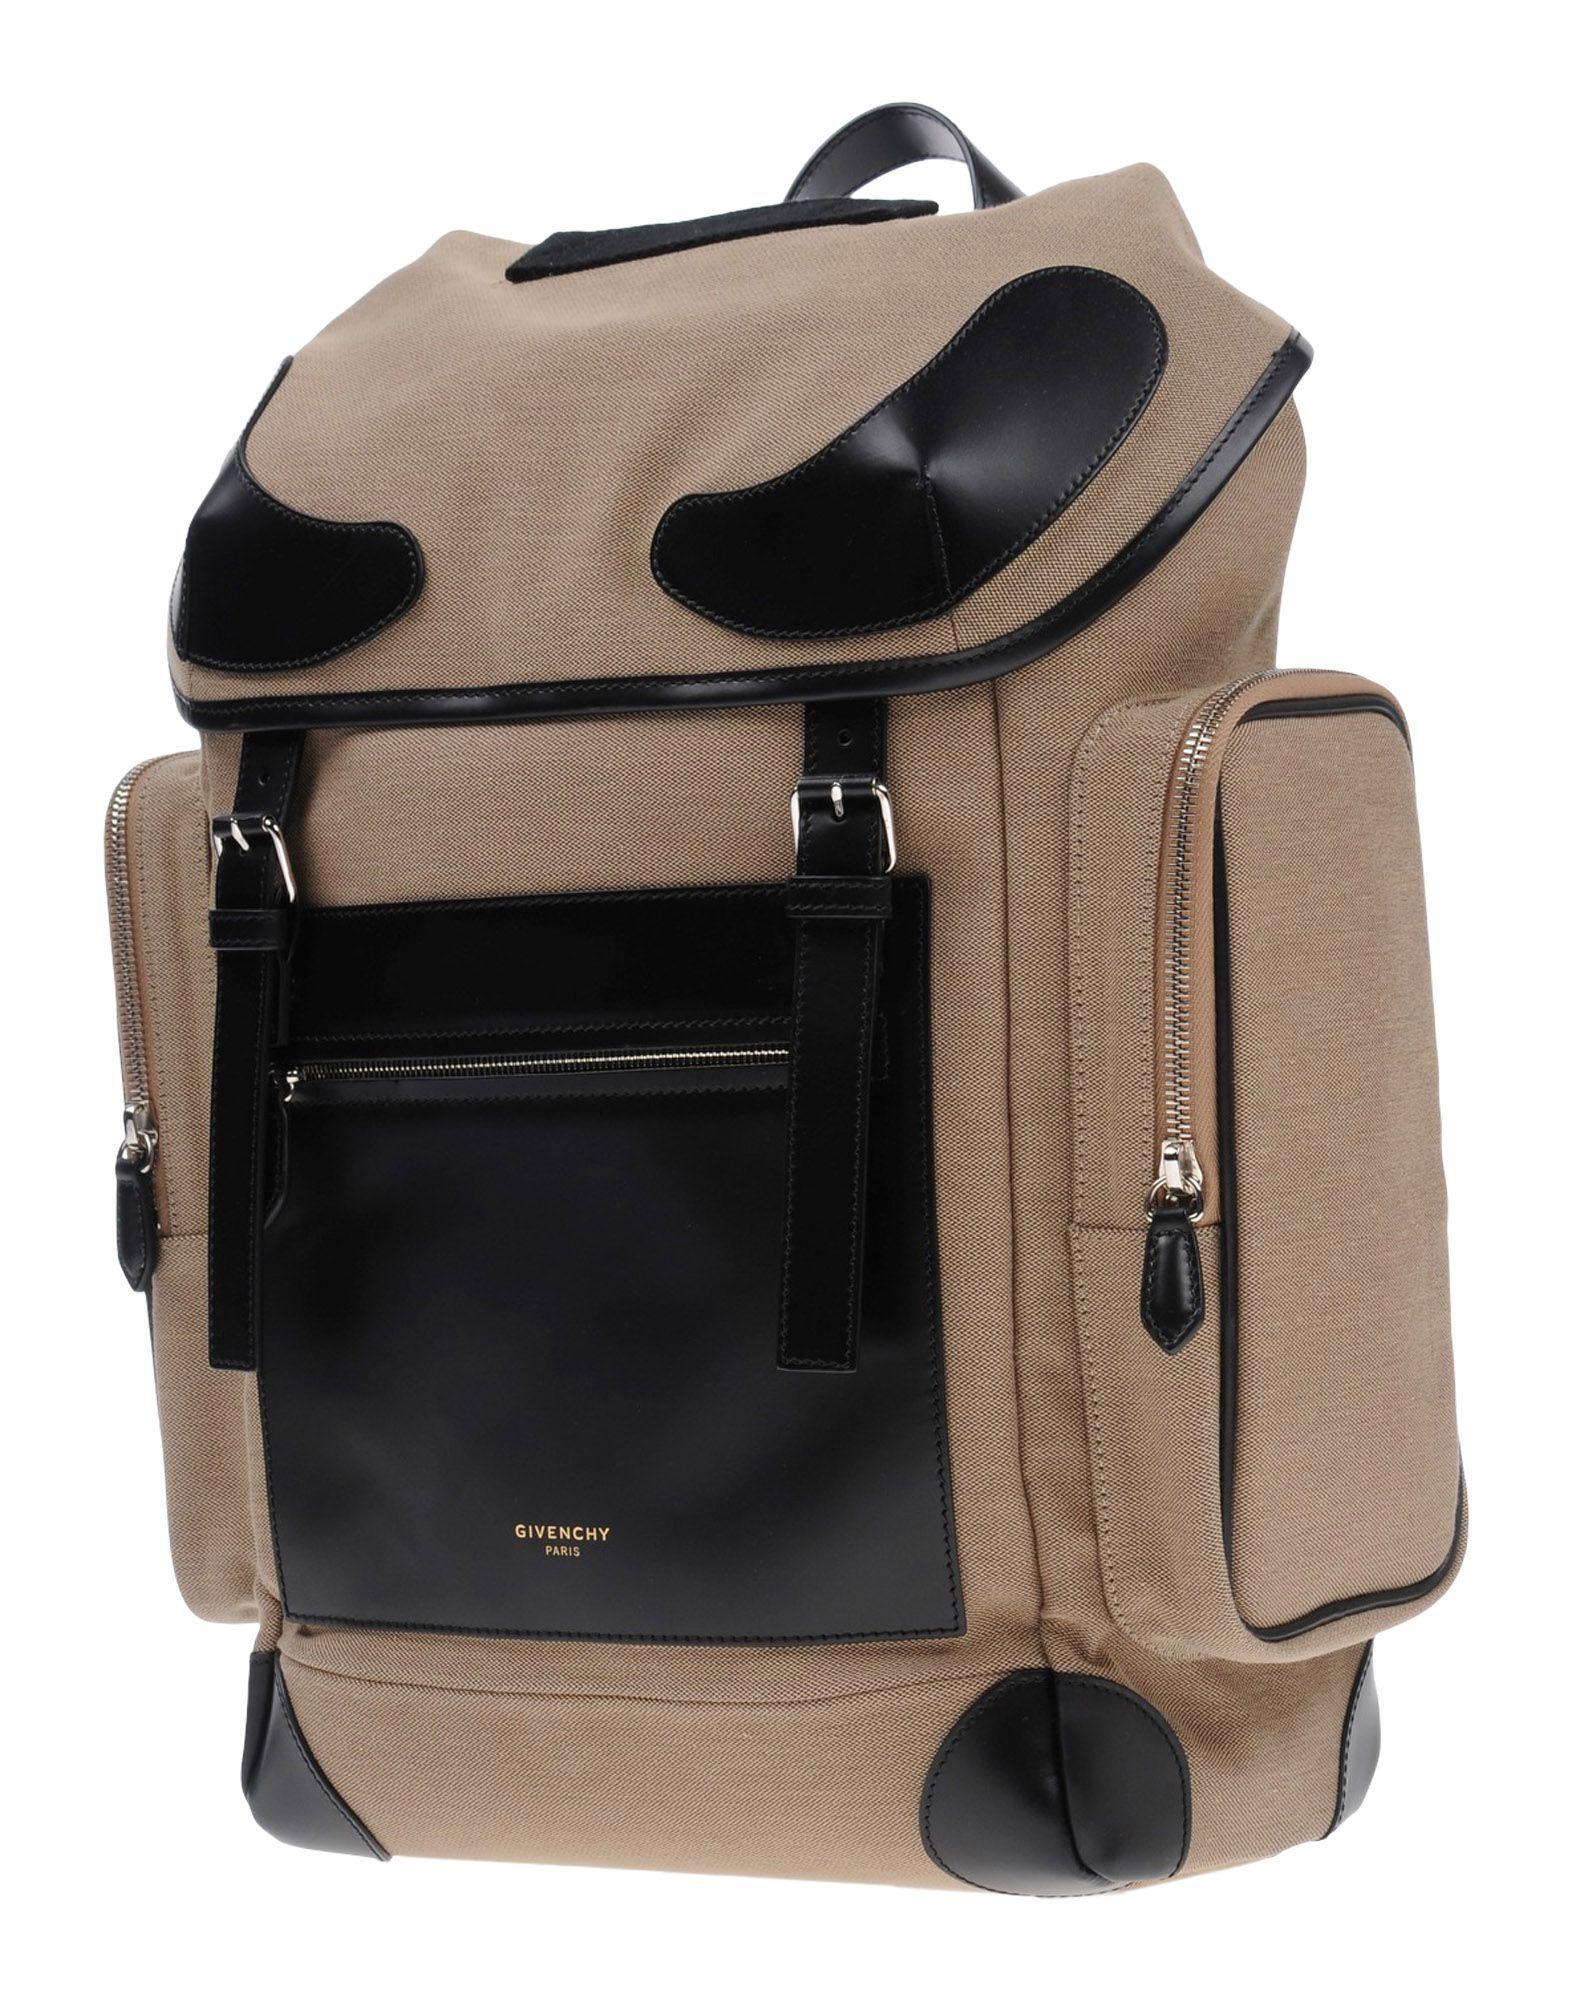 e8f6b297e1 GIVENCHY BACKPACKS   FANNY PACKS.  givenchy  bags  leather  backpacks   cotton